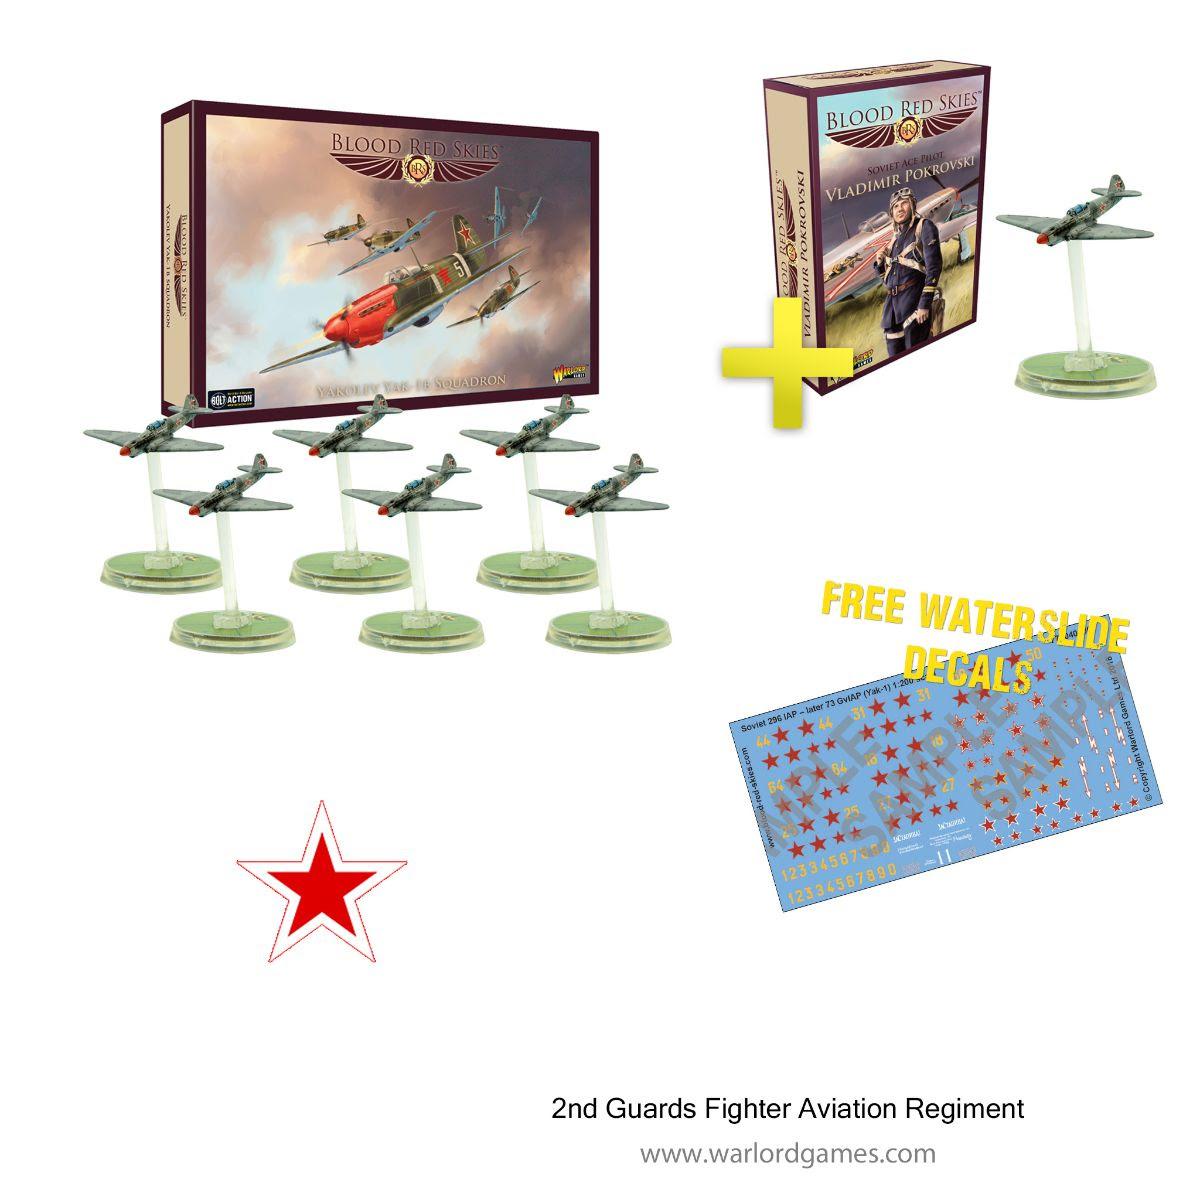 2nd Guards Fighter Aviation Regiment